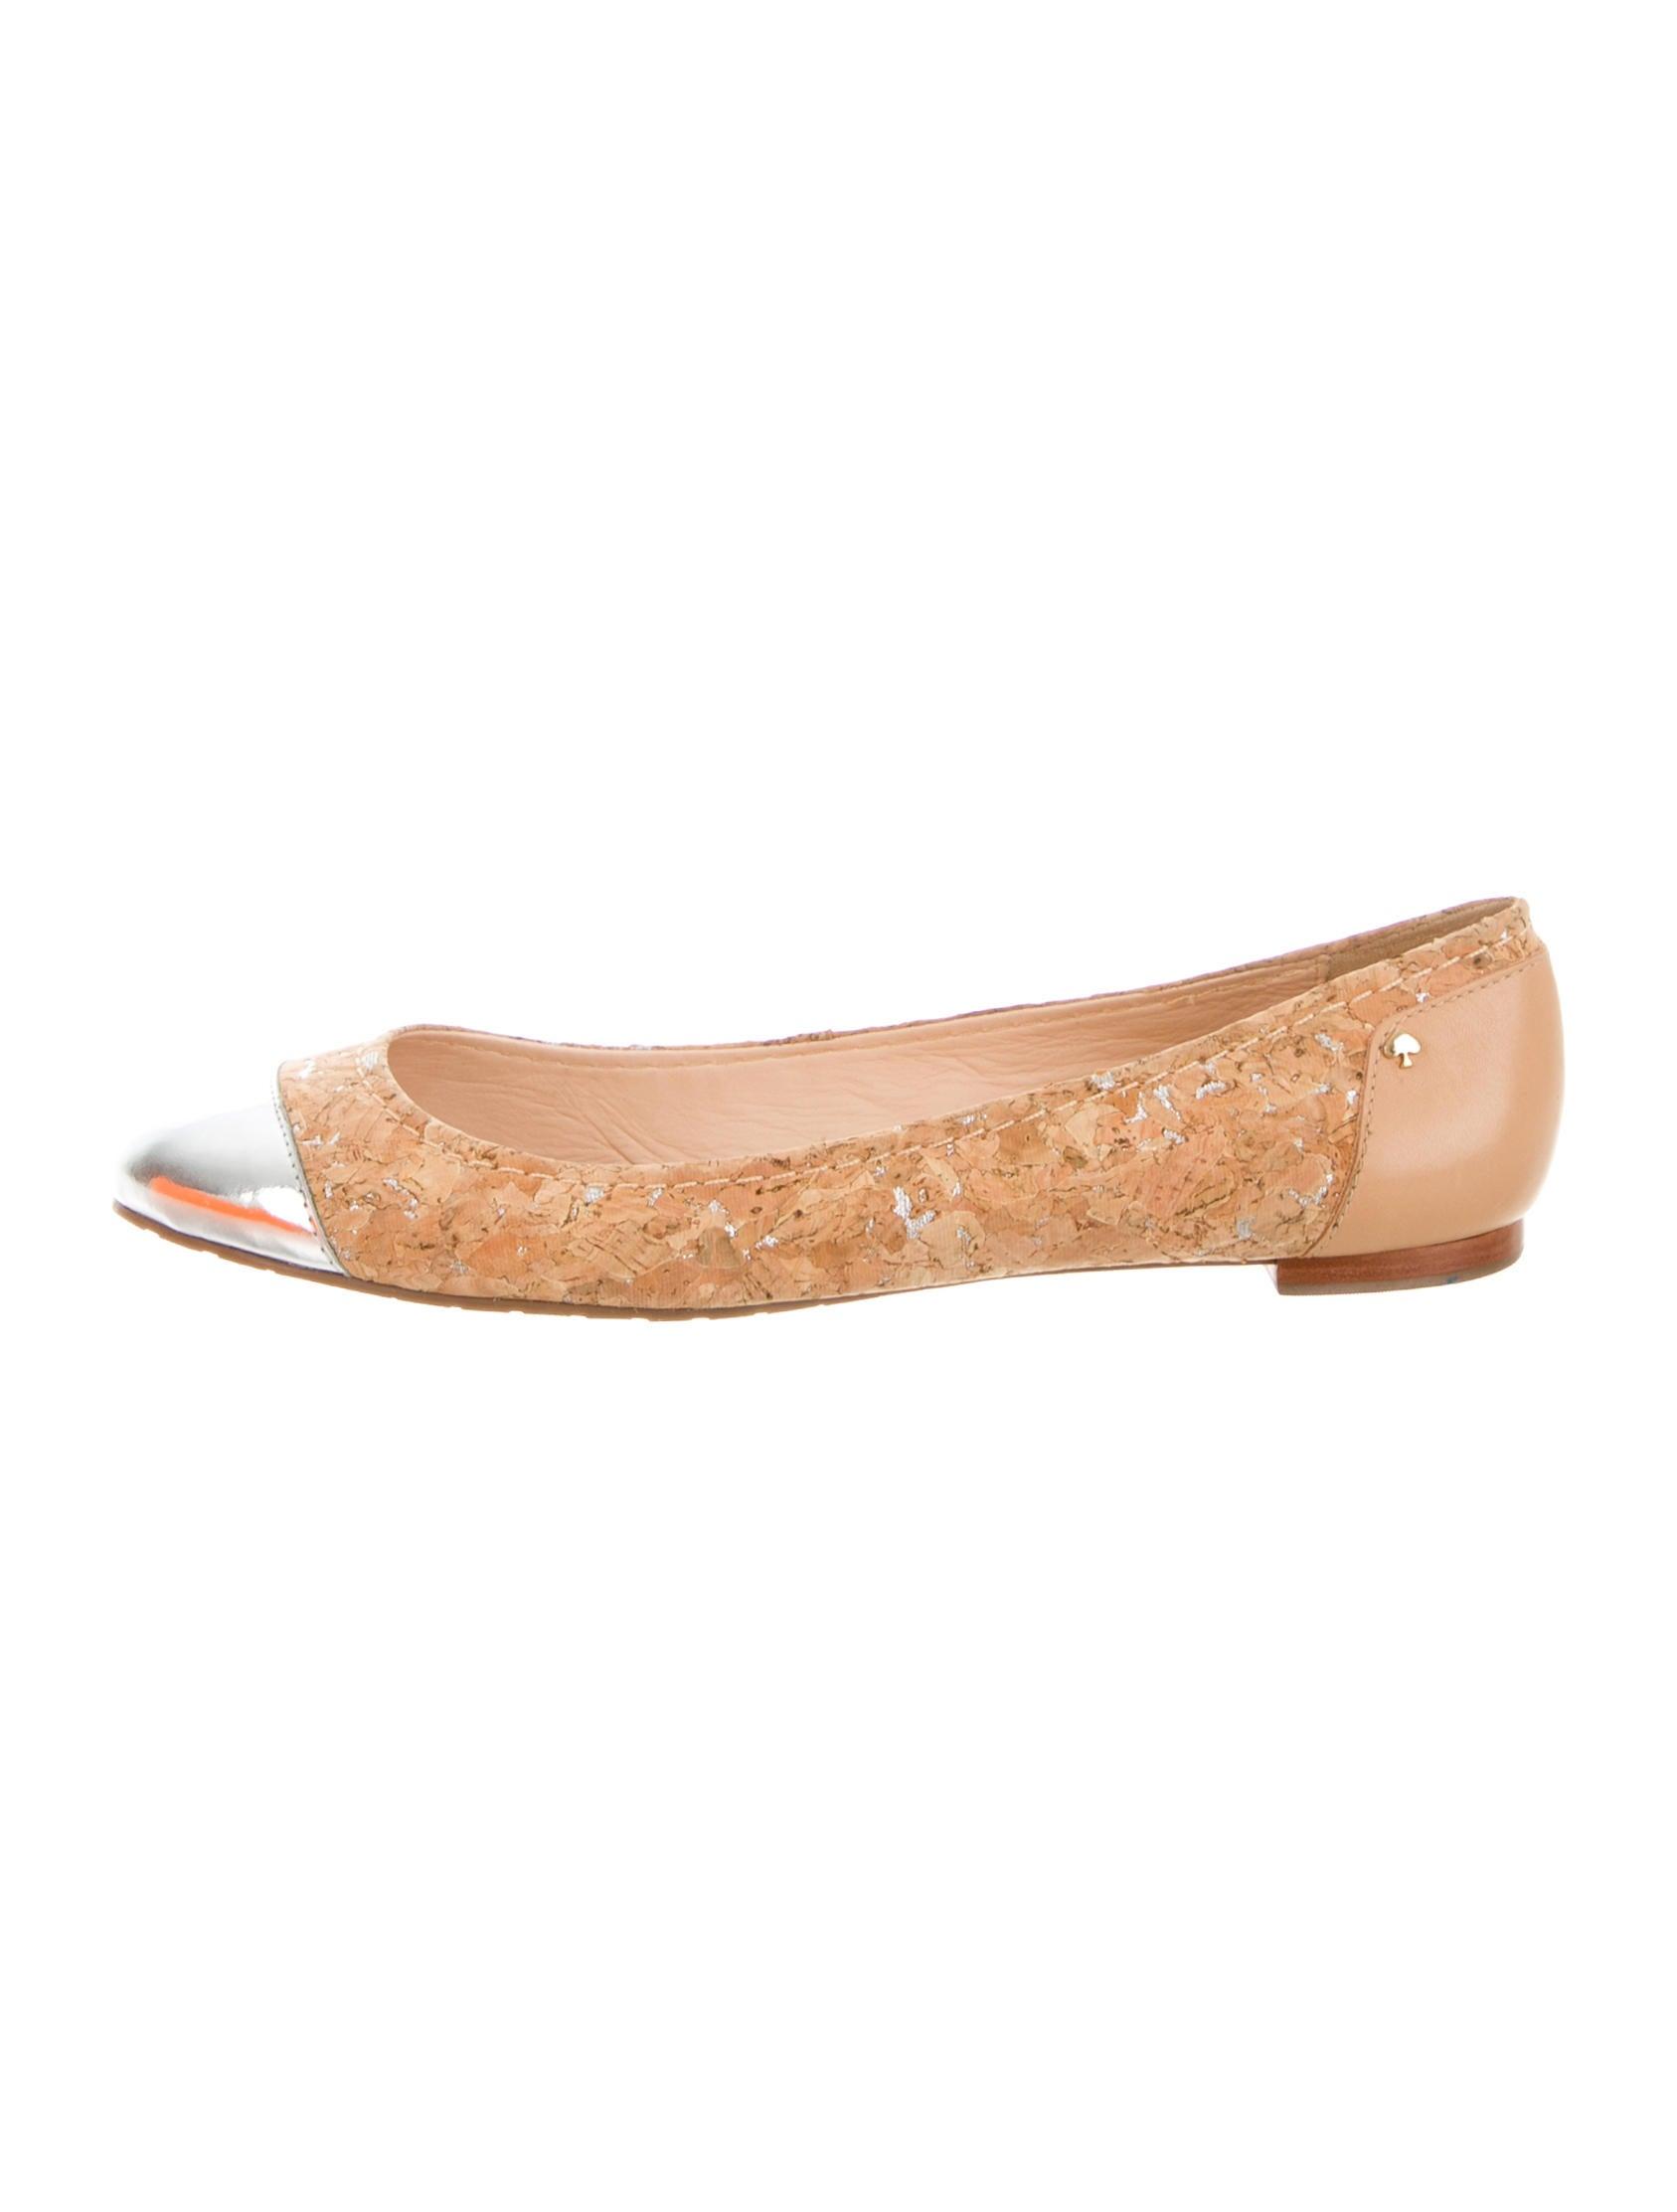 Kate spade new york cork cap toe flats shoes wka44662 for Kate spade new york flats